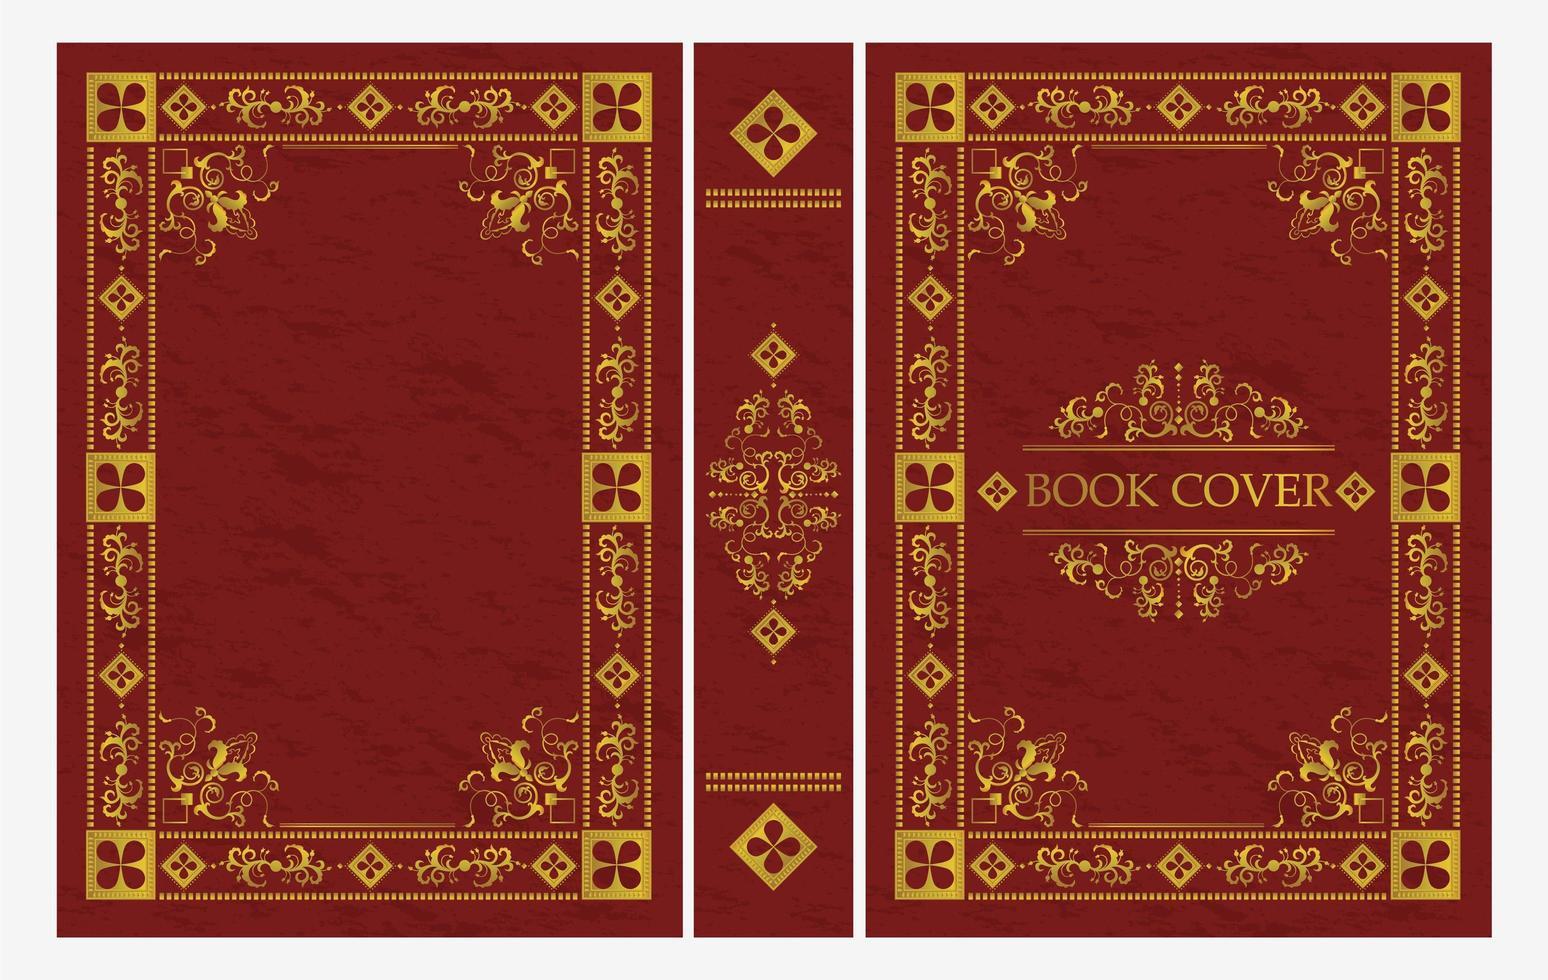 rot-goldenes Ornament des klassischen Buchumschlags vektor